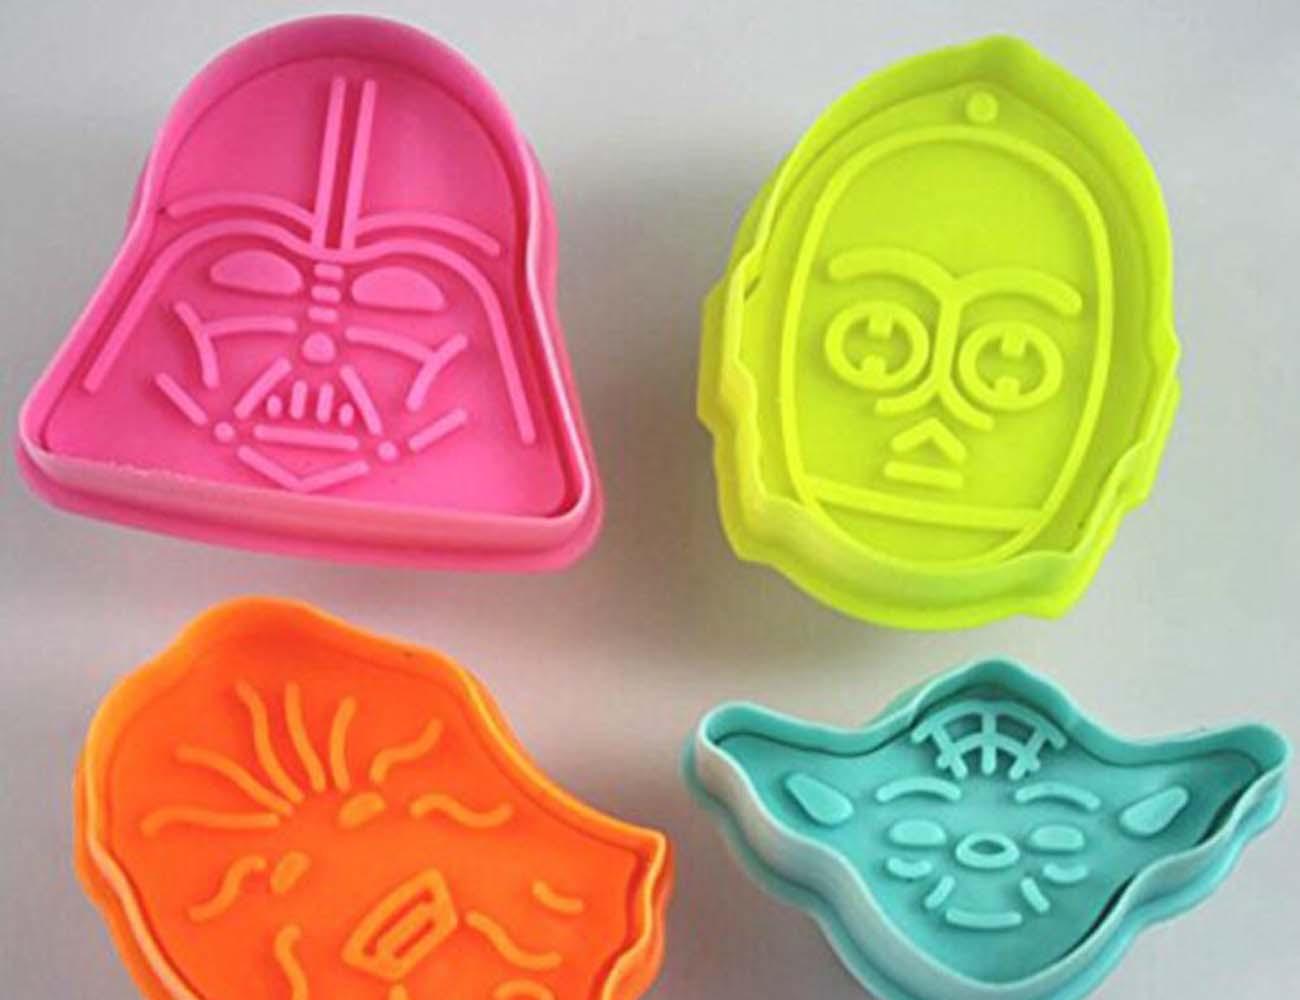 Star Wars Press Stamp Cookie Cutters